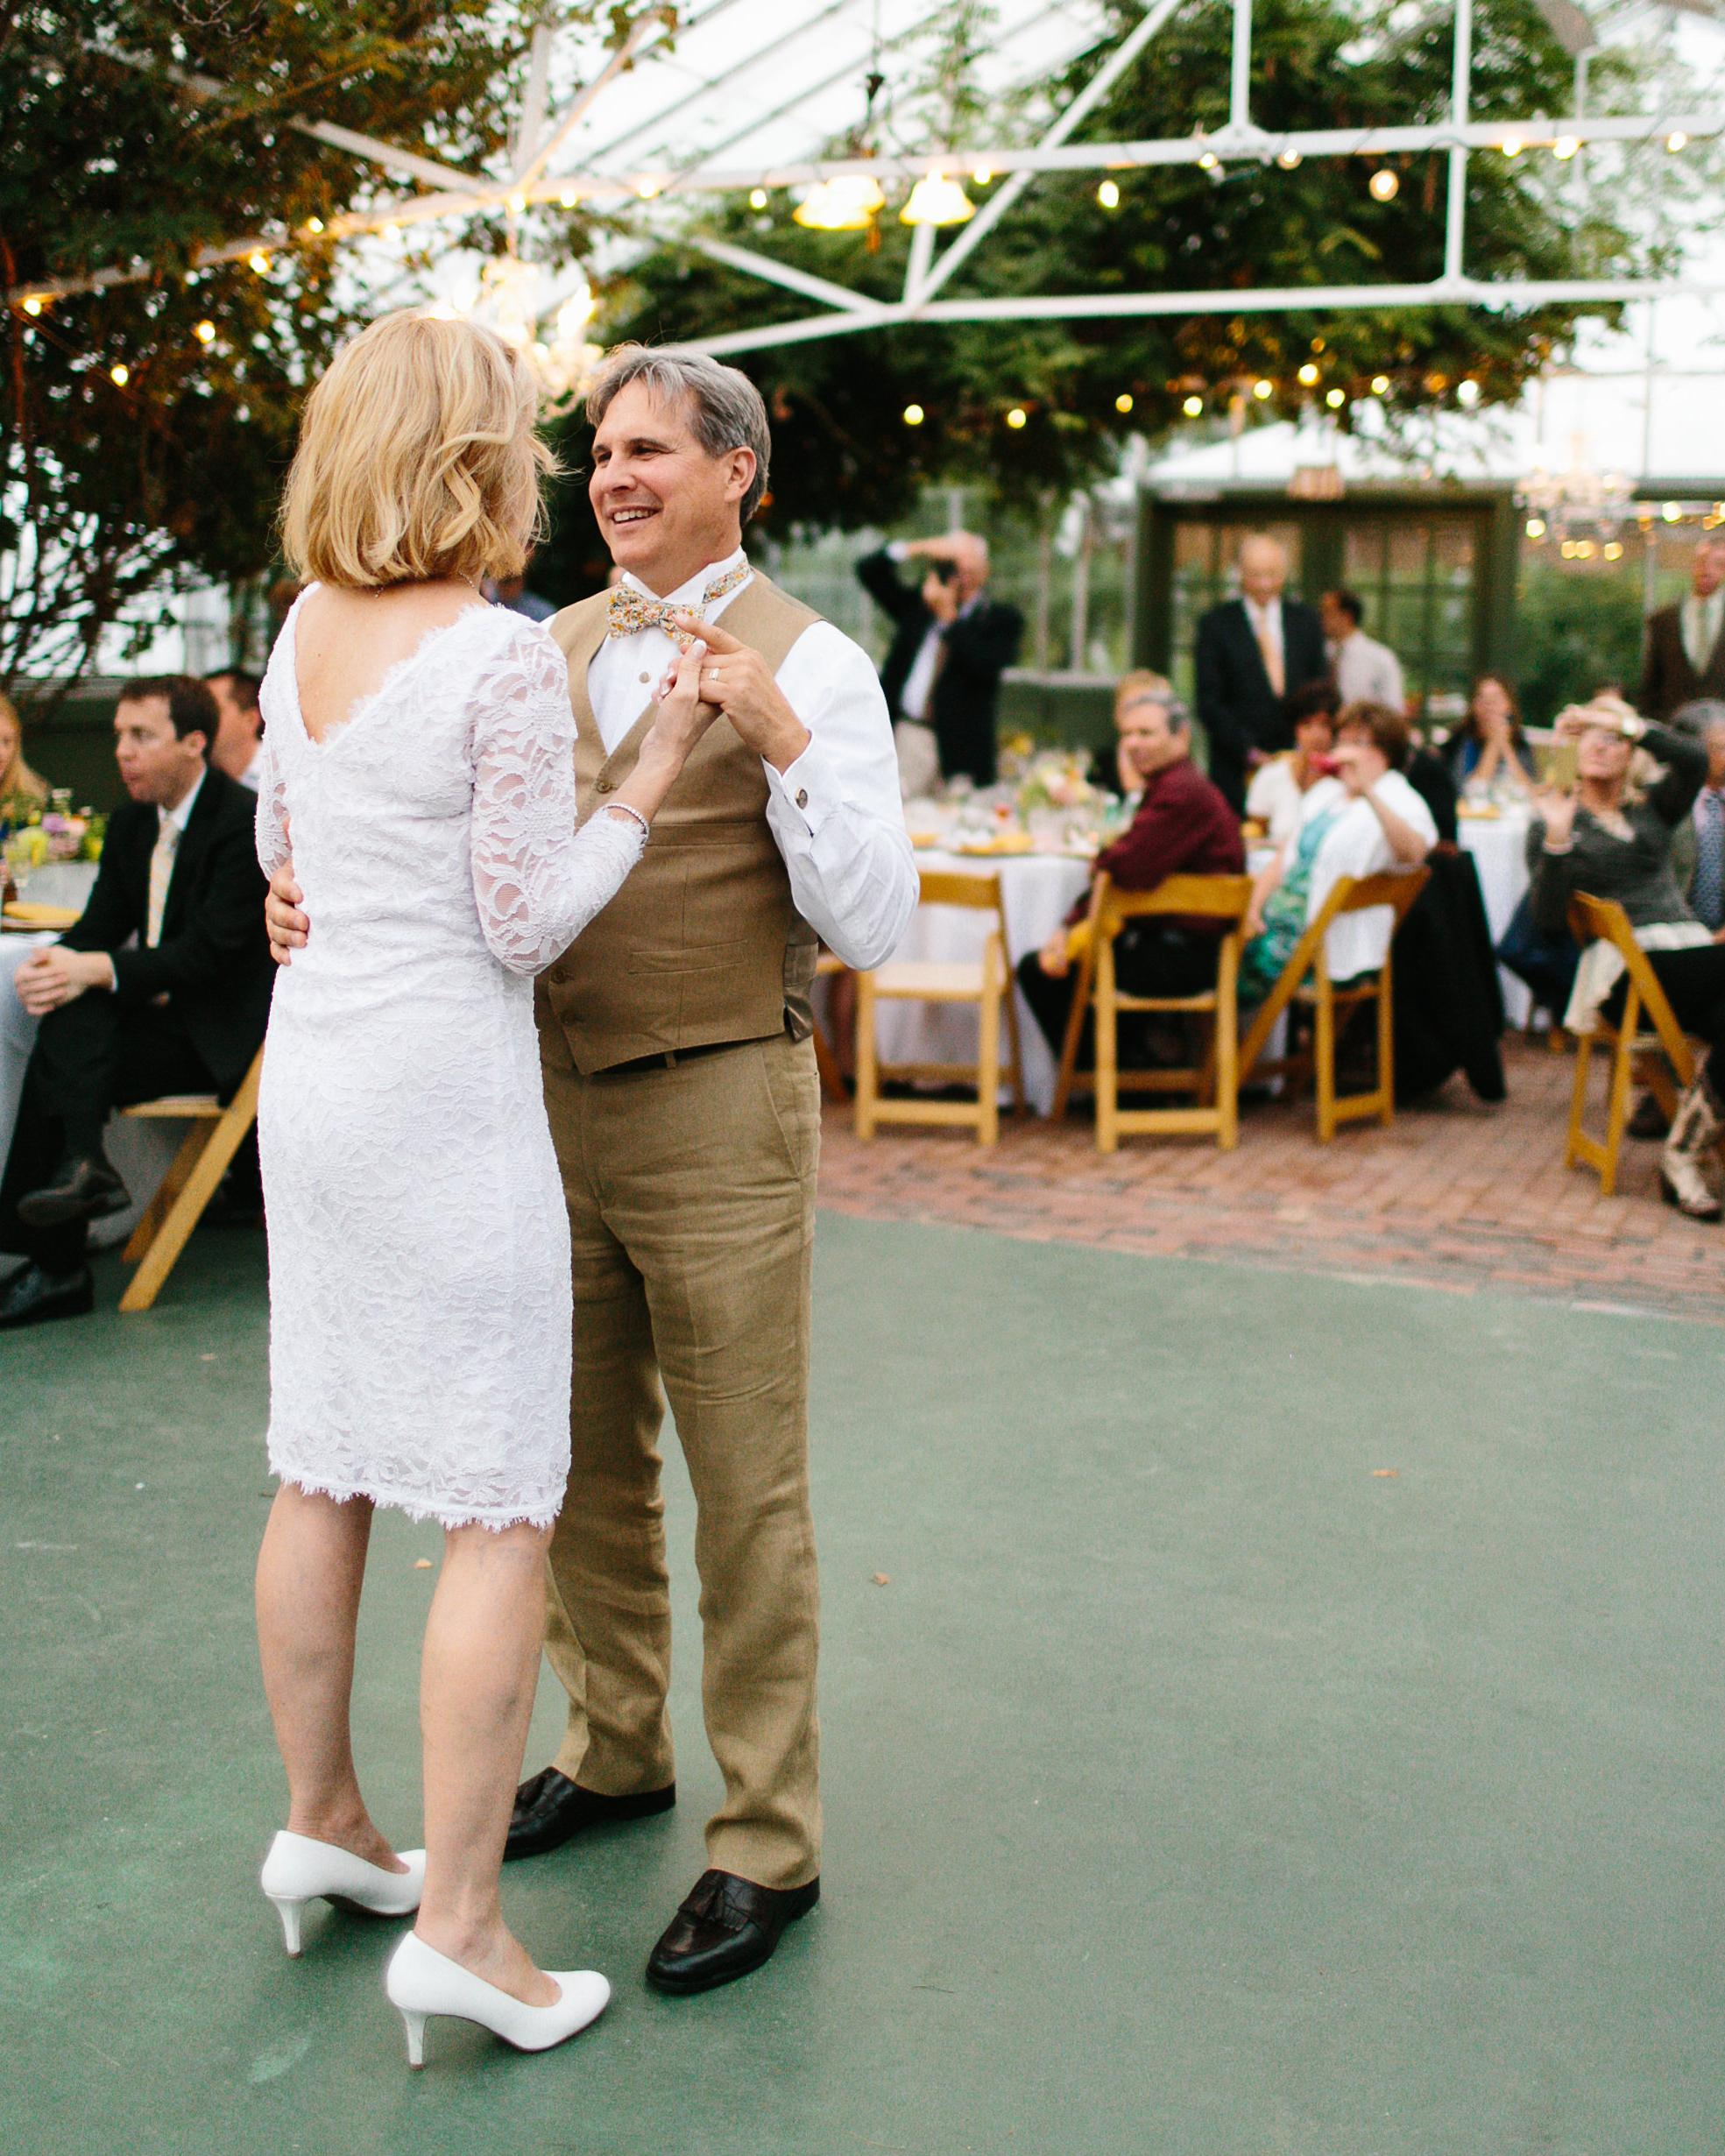 sandy-dwight-wedding-dance-0514.jpg